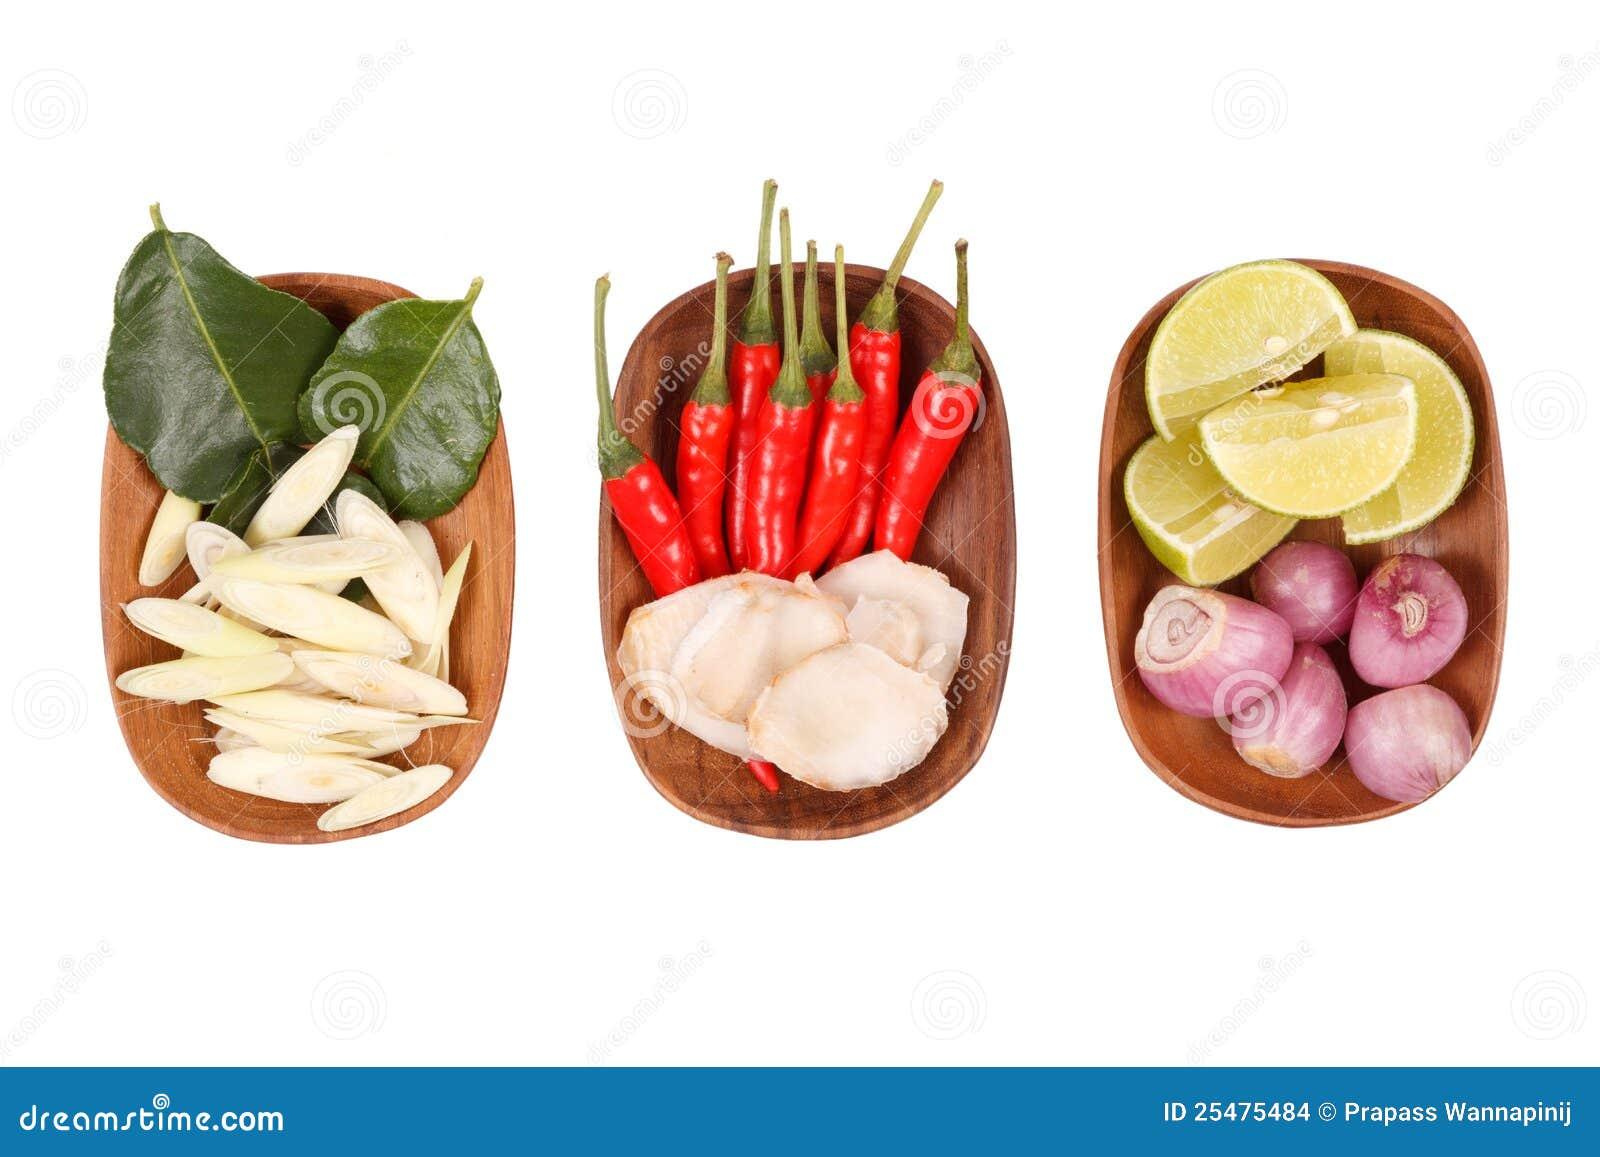 Spicy thai food ingredients stock photo image of herb spicy 25475484 download spicy thai food ingredients stock photo image of herb spicy 25475484 forumfinder Choice Image